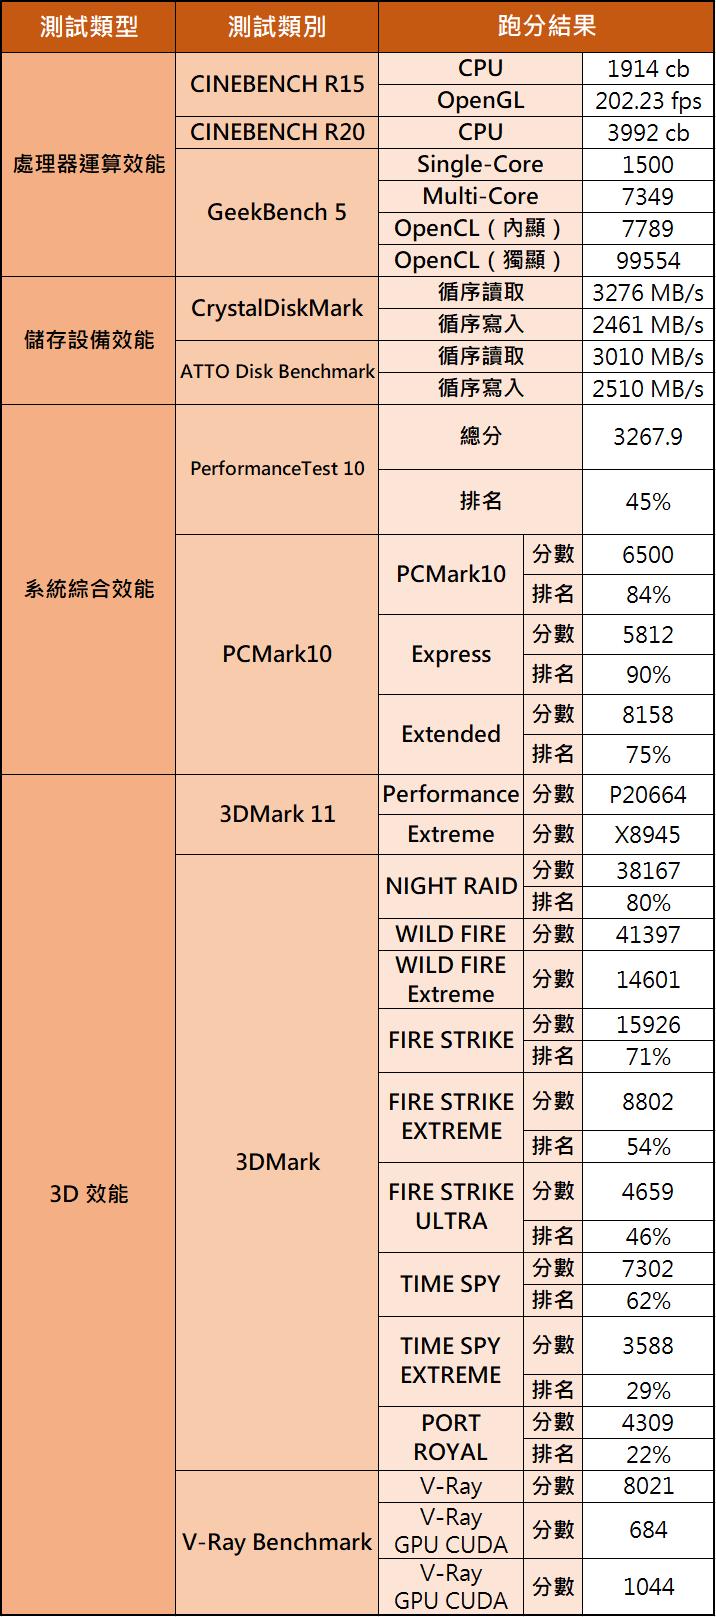 Genuine 捷元 ZEUS 15H 開箱評測:Intel H45 與 GeForce RTX 30 系列強強聯手,效能表現再升級!